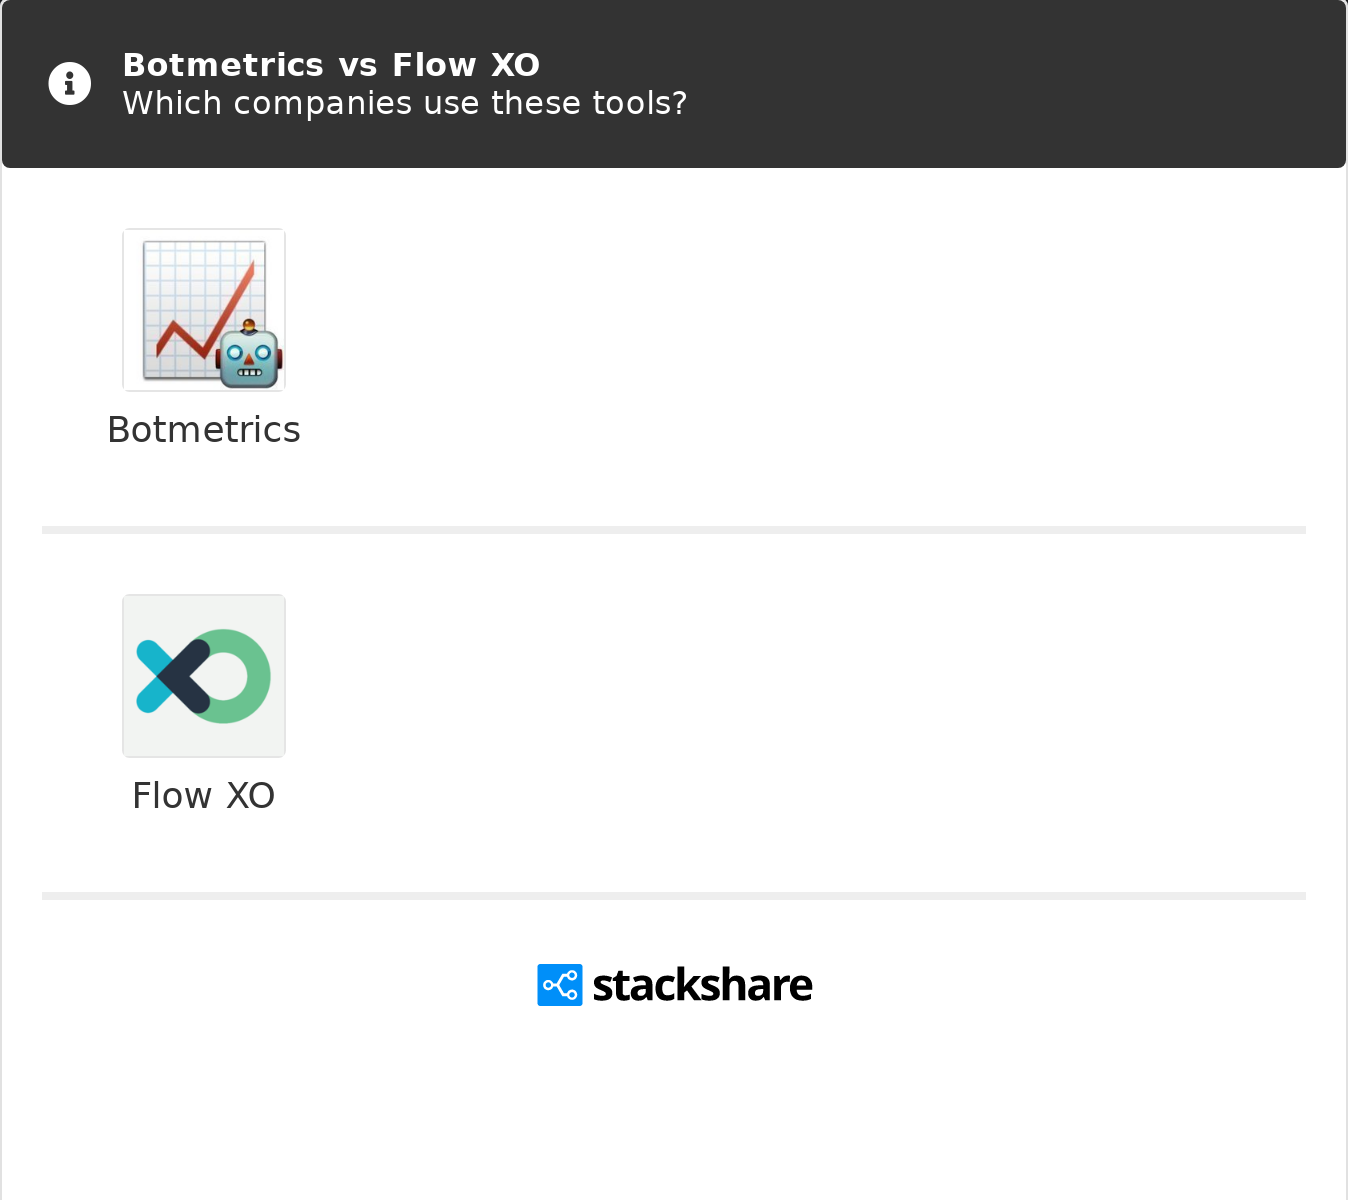 Botmetrics vs Flow XO | What are the differences?